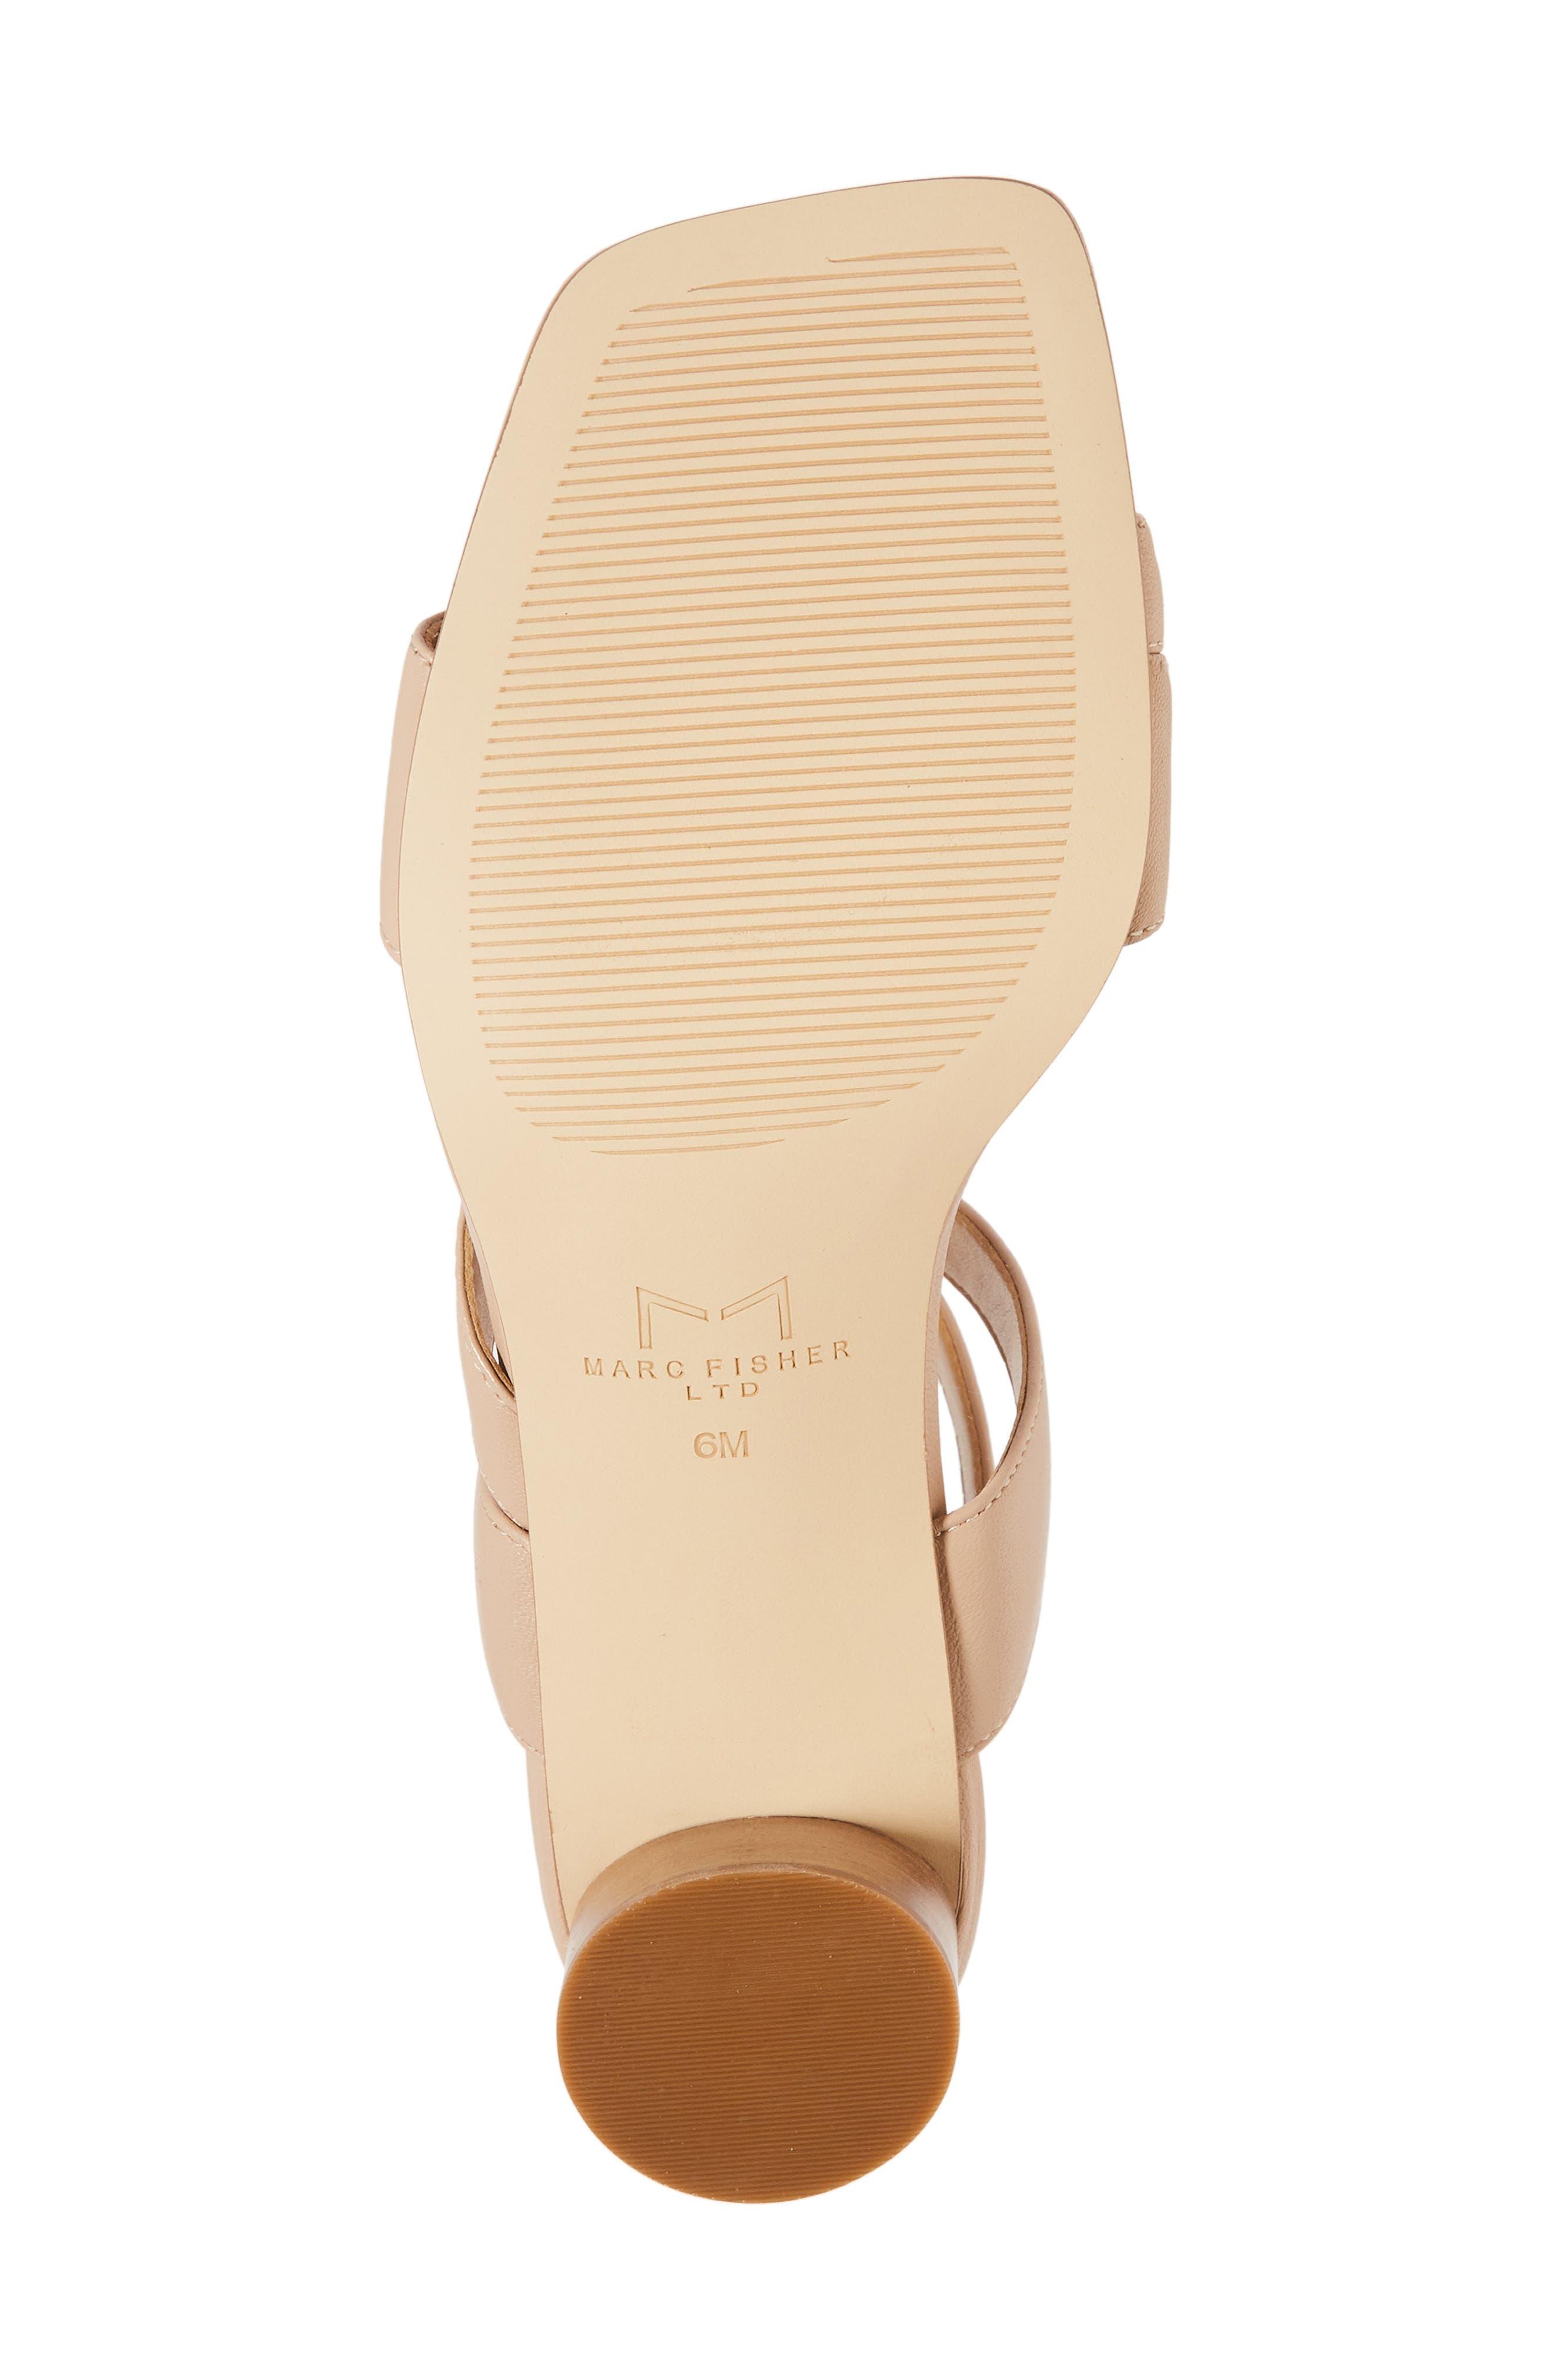 Marc Fischer LTD Idana Strappy Sandal,                             Alternate thumbnail 6, color,                             Lite Latte Leather